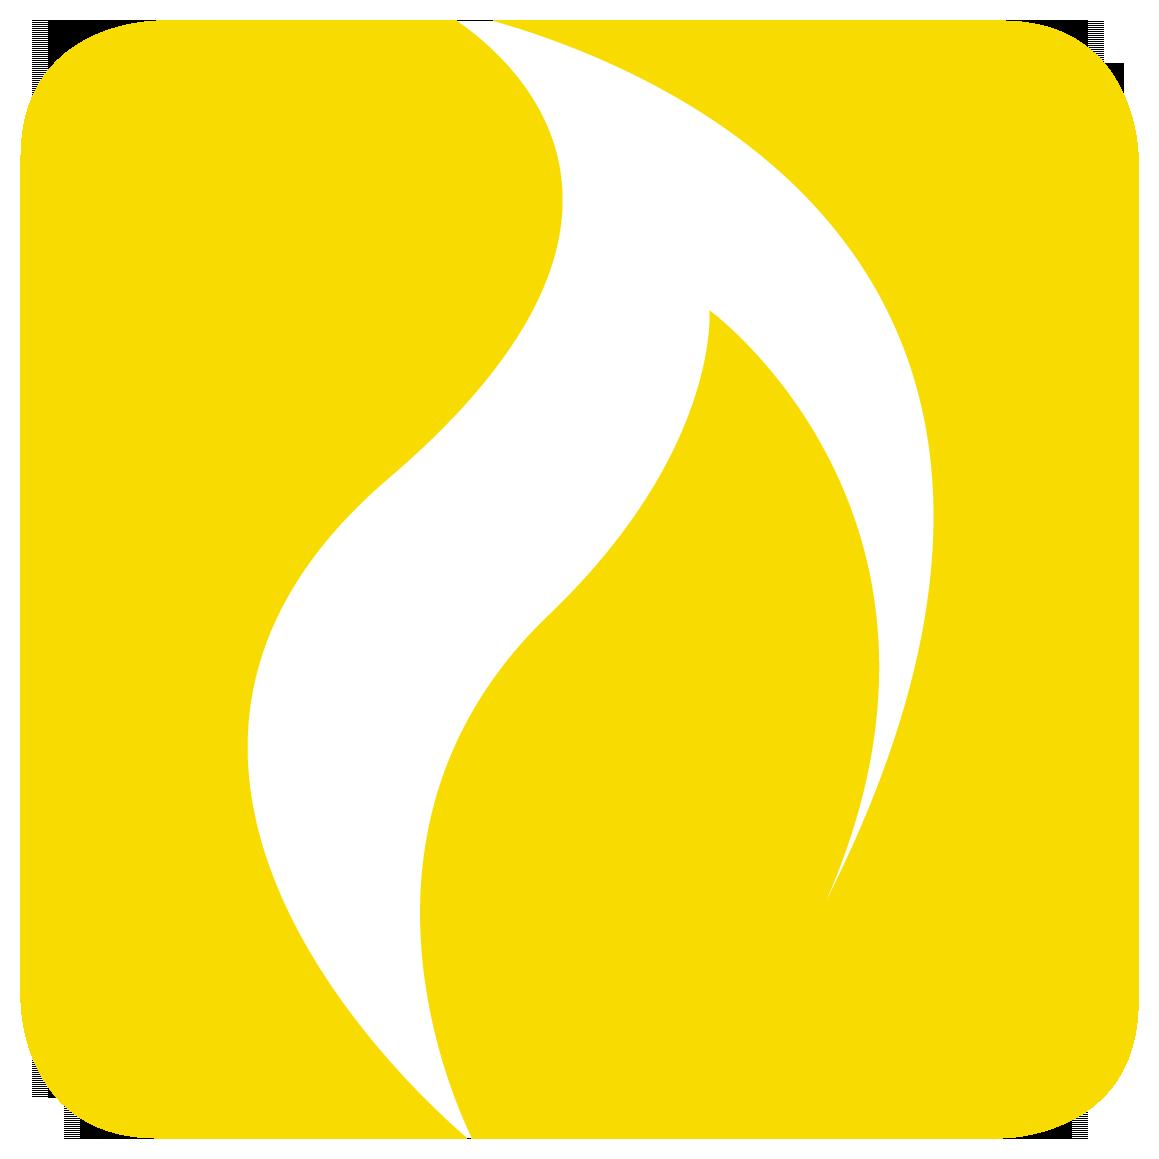 » Mediacenter-Datenarchiv » Bilder_Gas » icon_gas_2.png